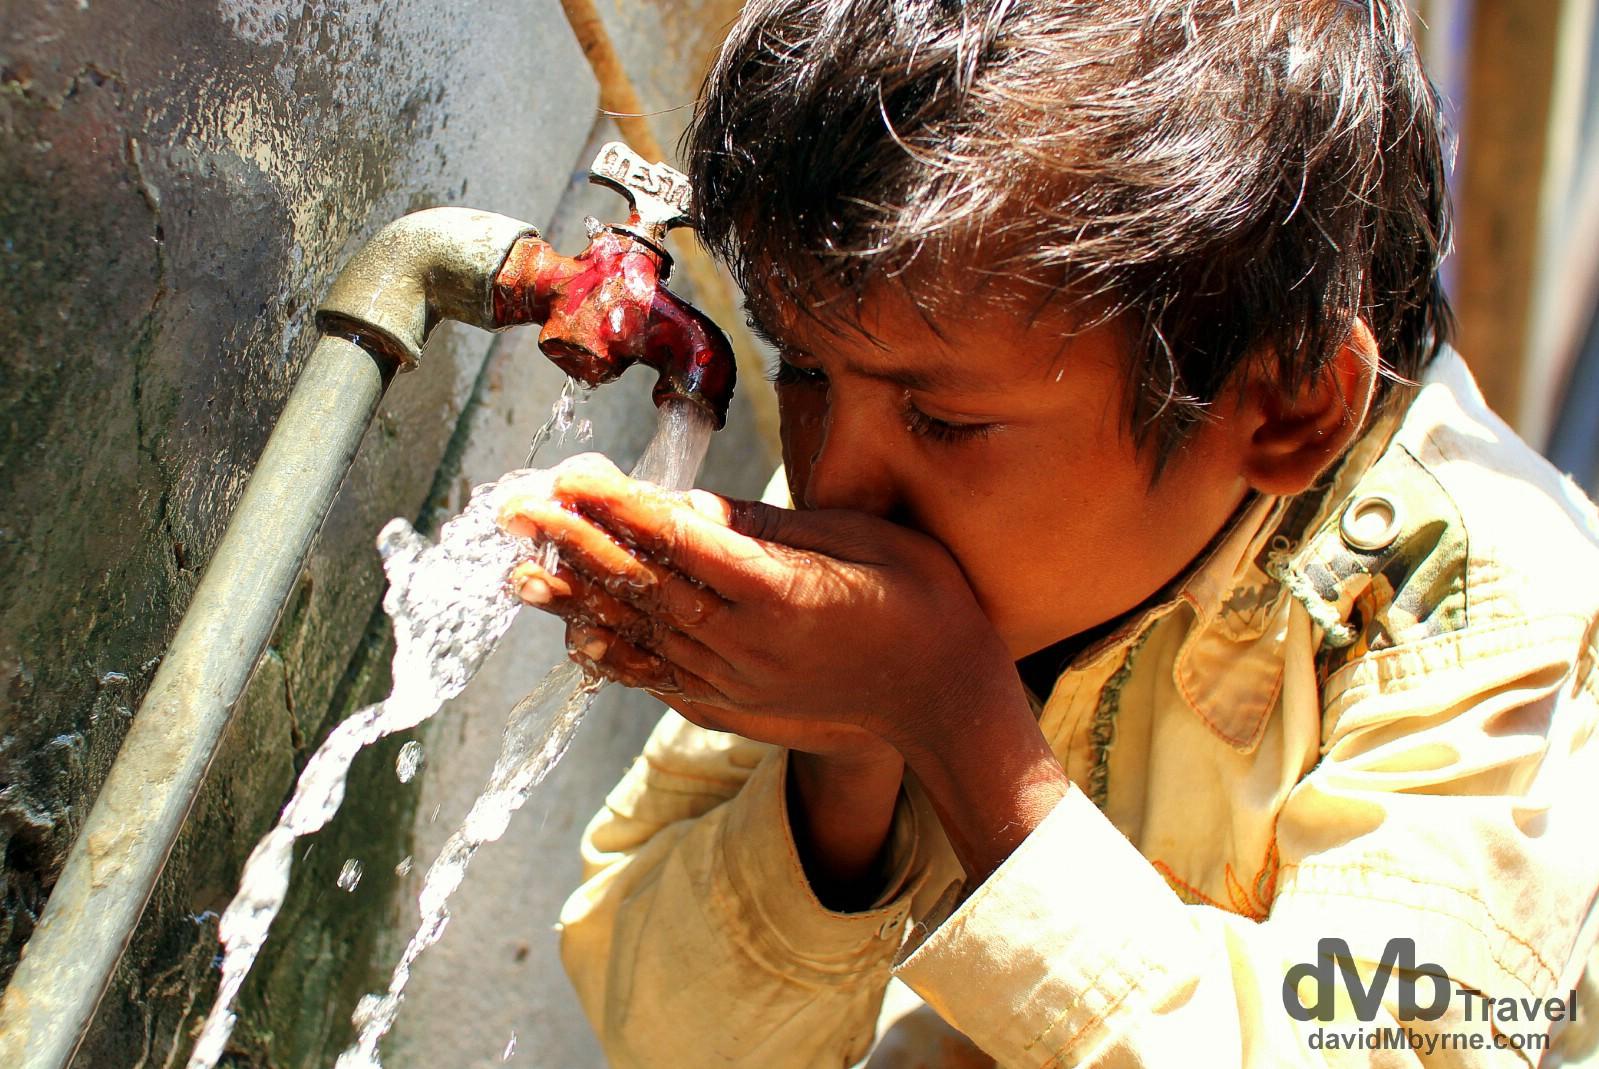 Rehydrating in the narrow lanes of old town Varanasi, Uttar Pradesh, India. October 13th 2012.